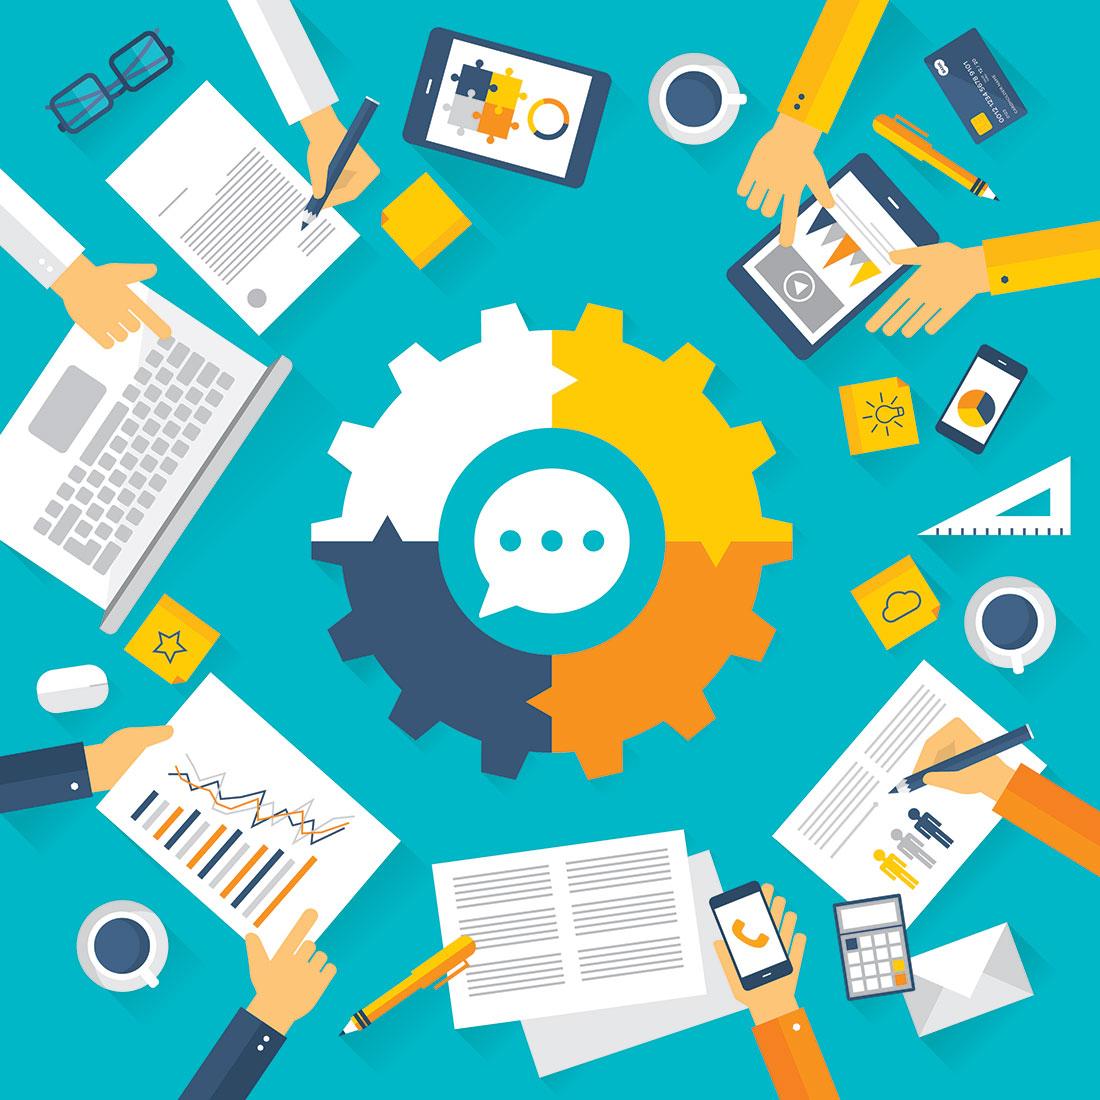 Help, I want to become a strategic communicator!